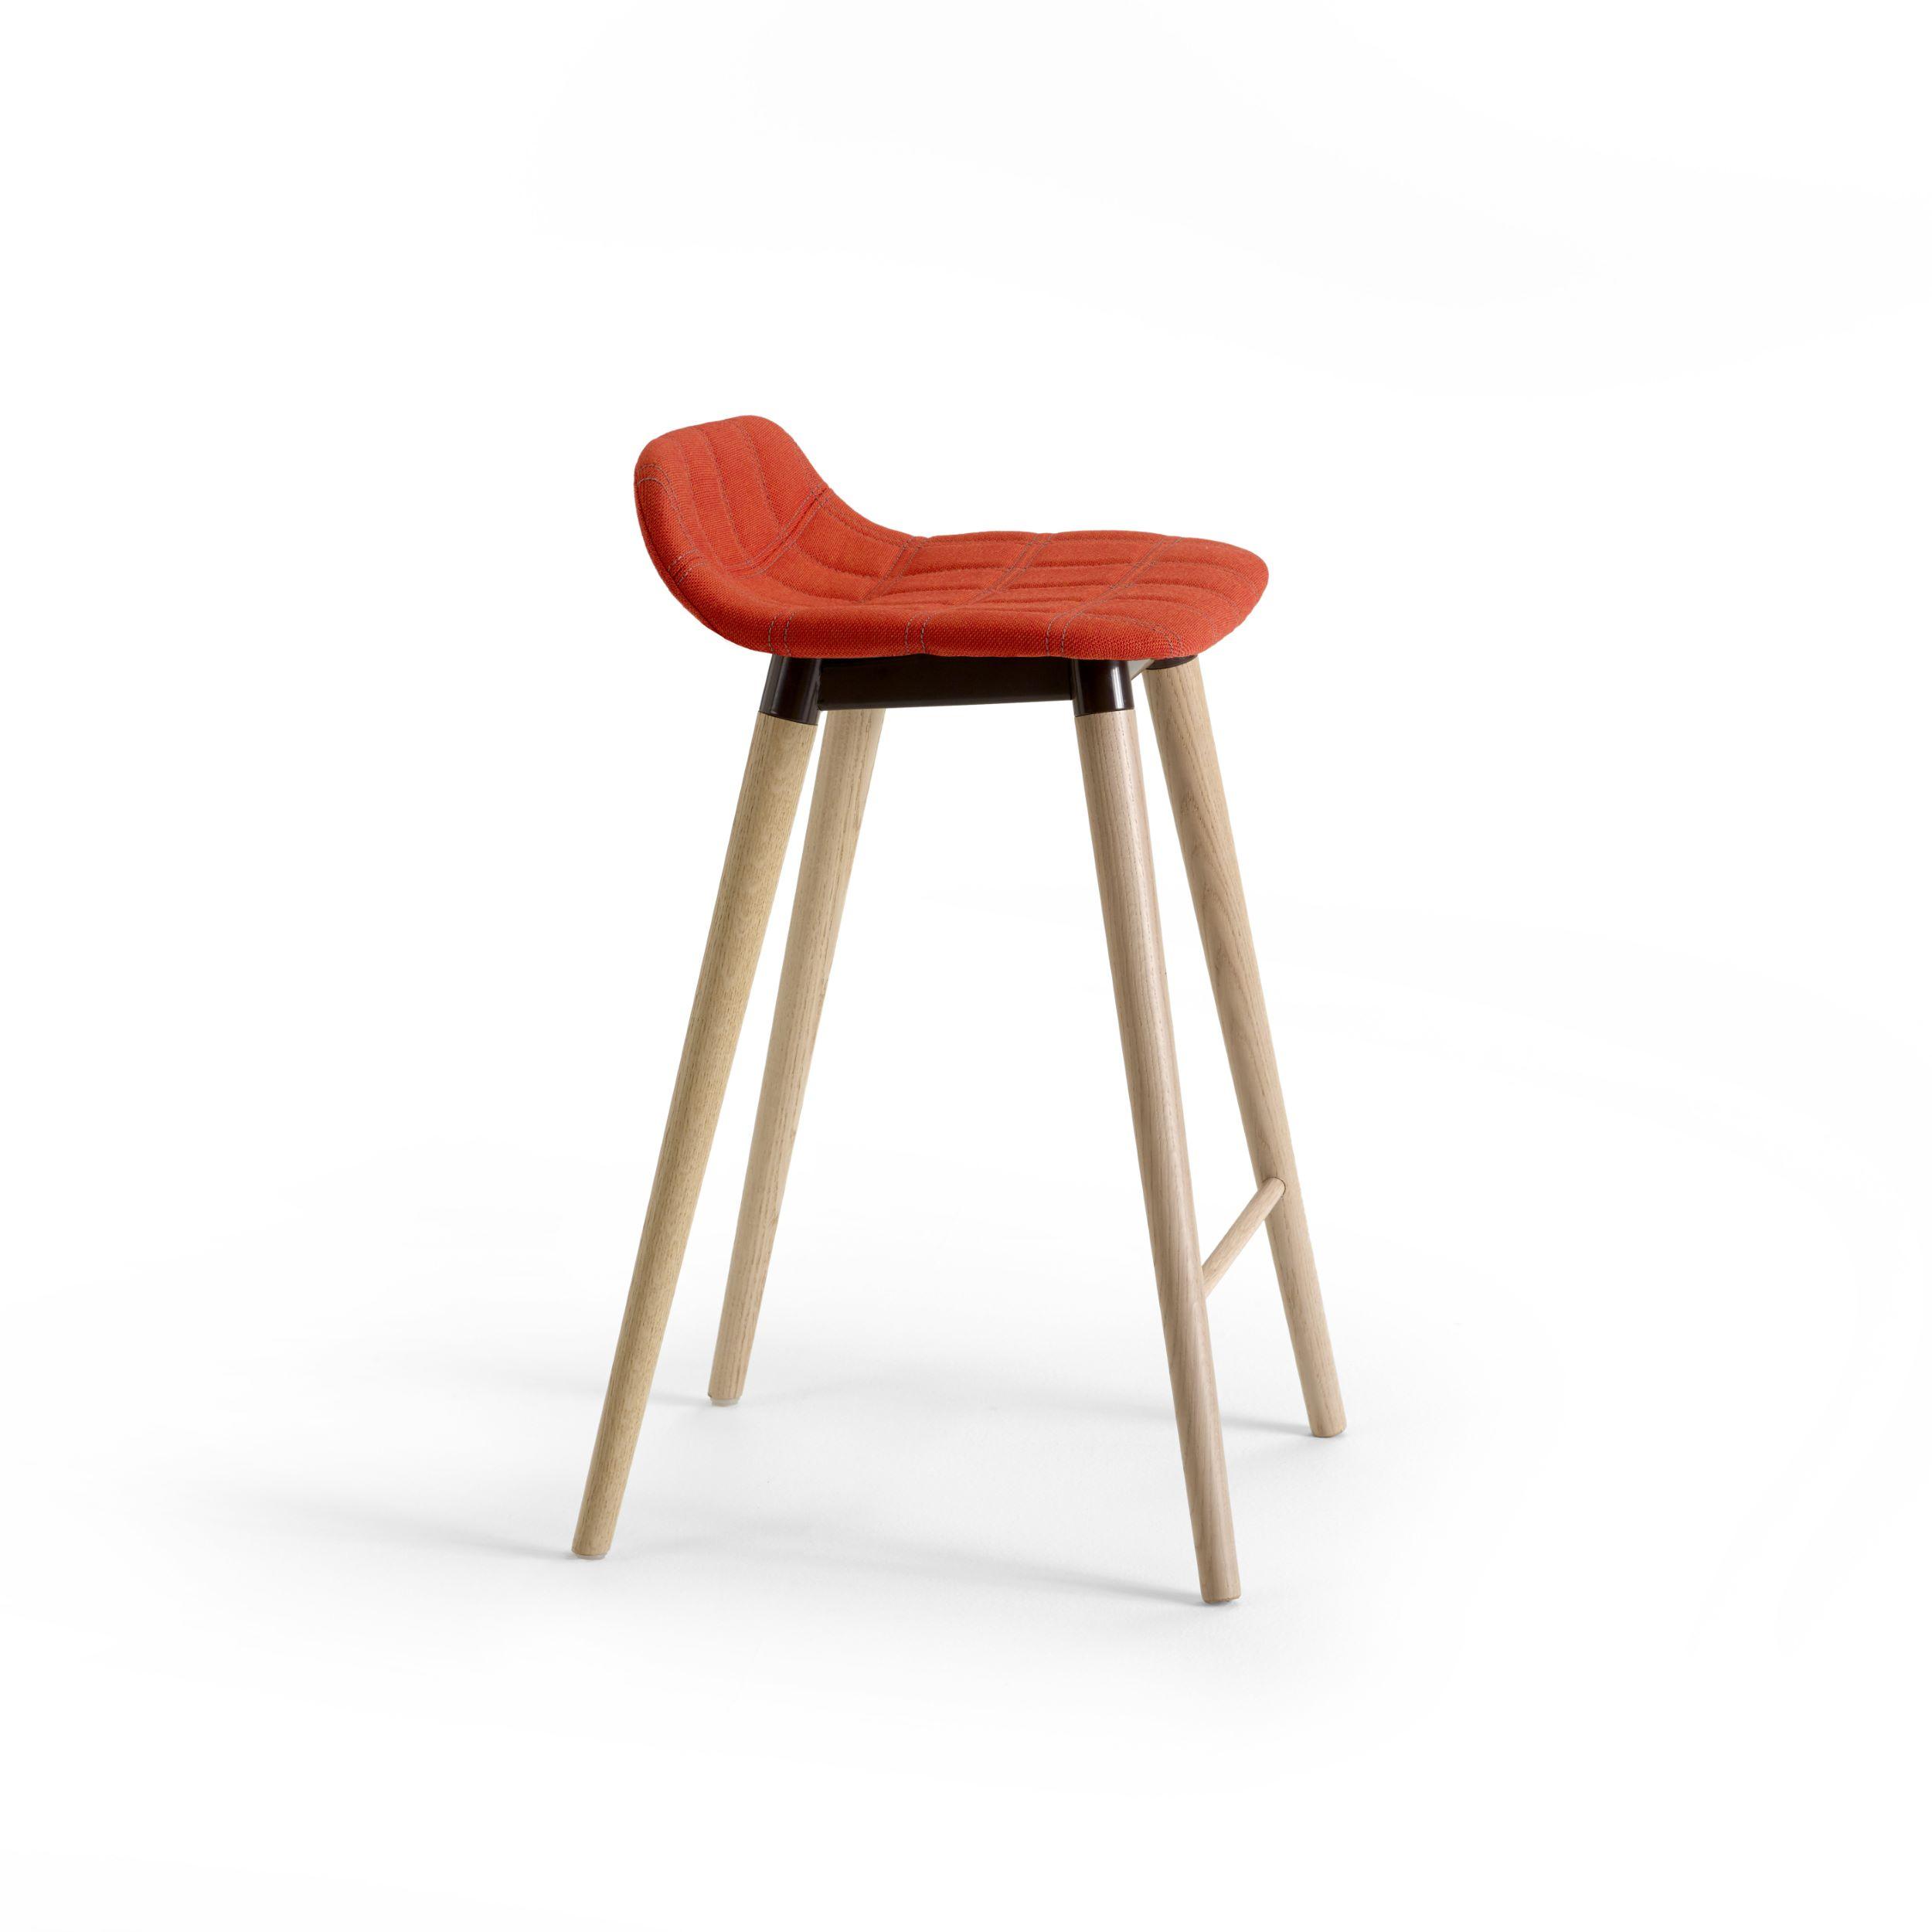 Bop Wood Bar Stool Furniture By Knudsen Berg Hindenes Offecct Offecct